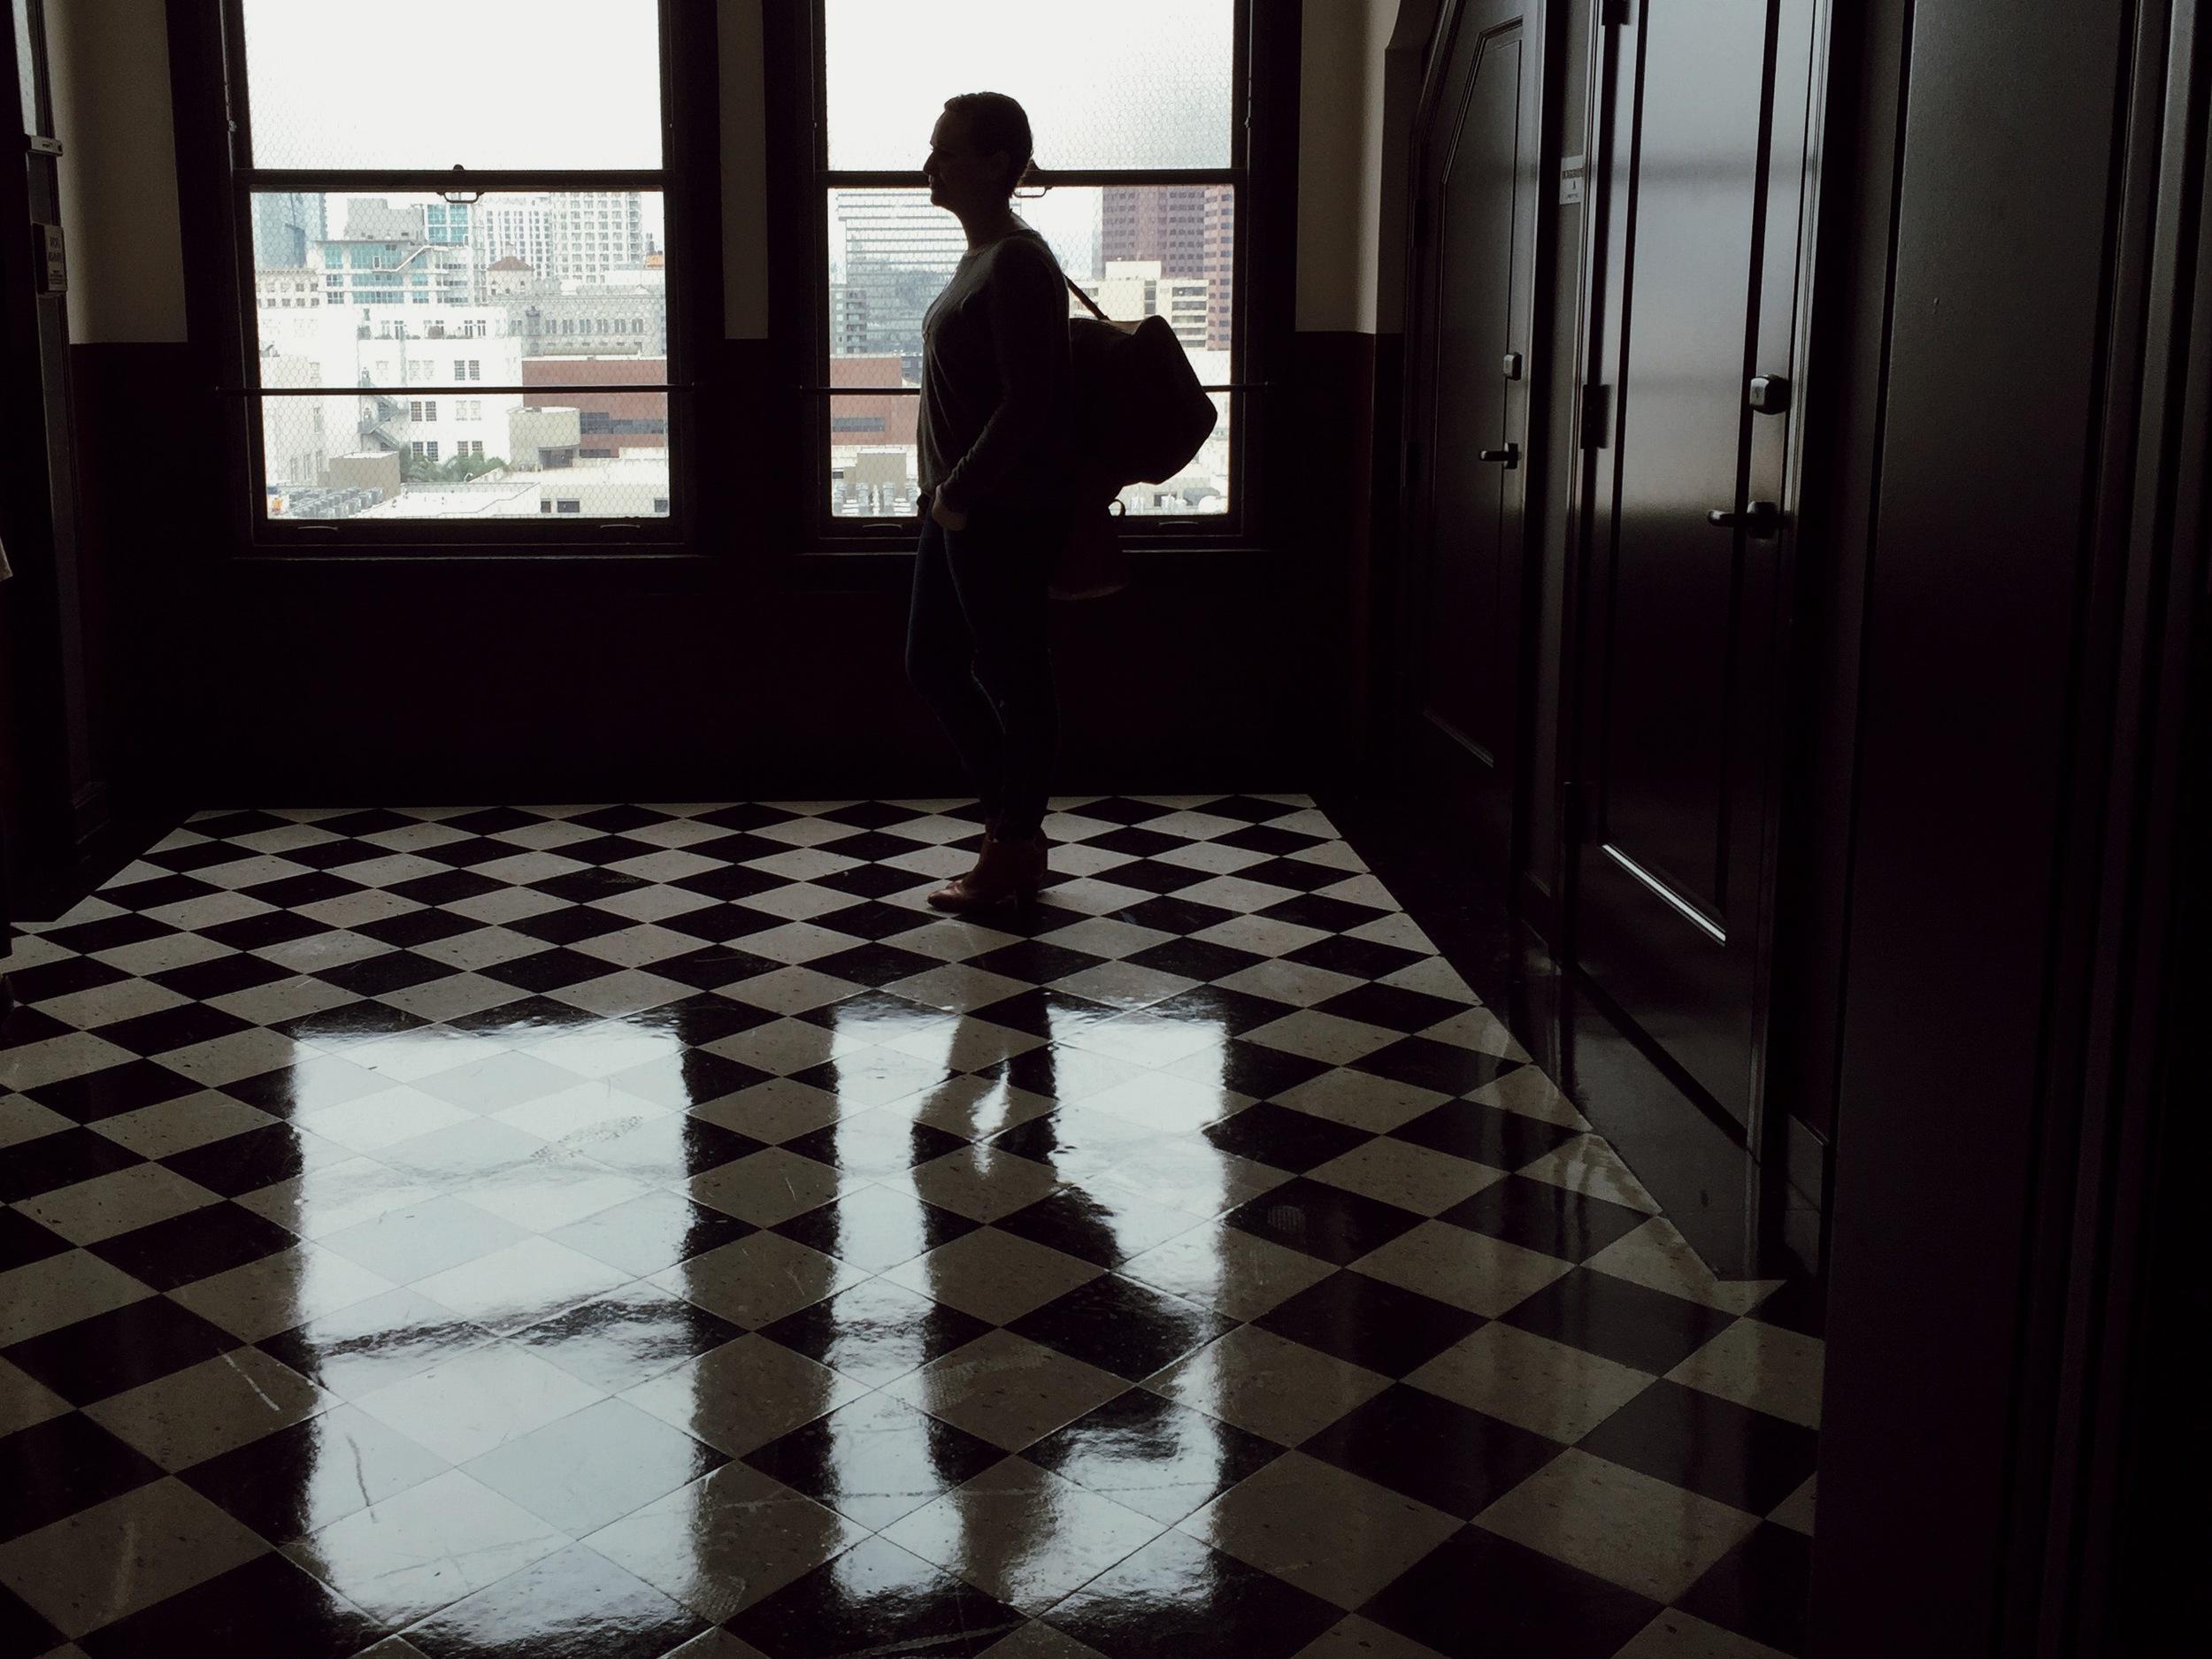 ace_hotel dec 05, 12 13 59 pm.jpg